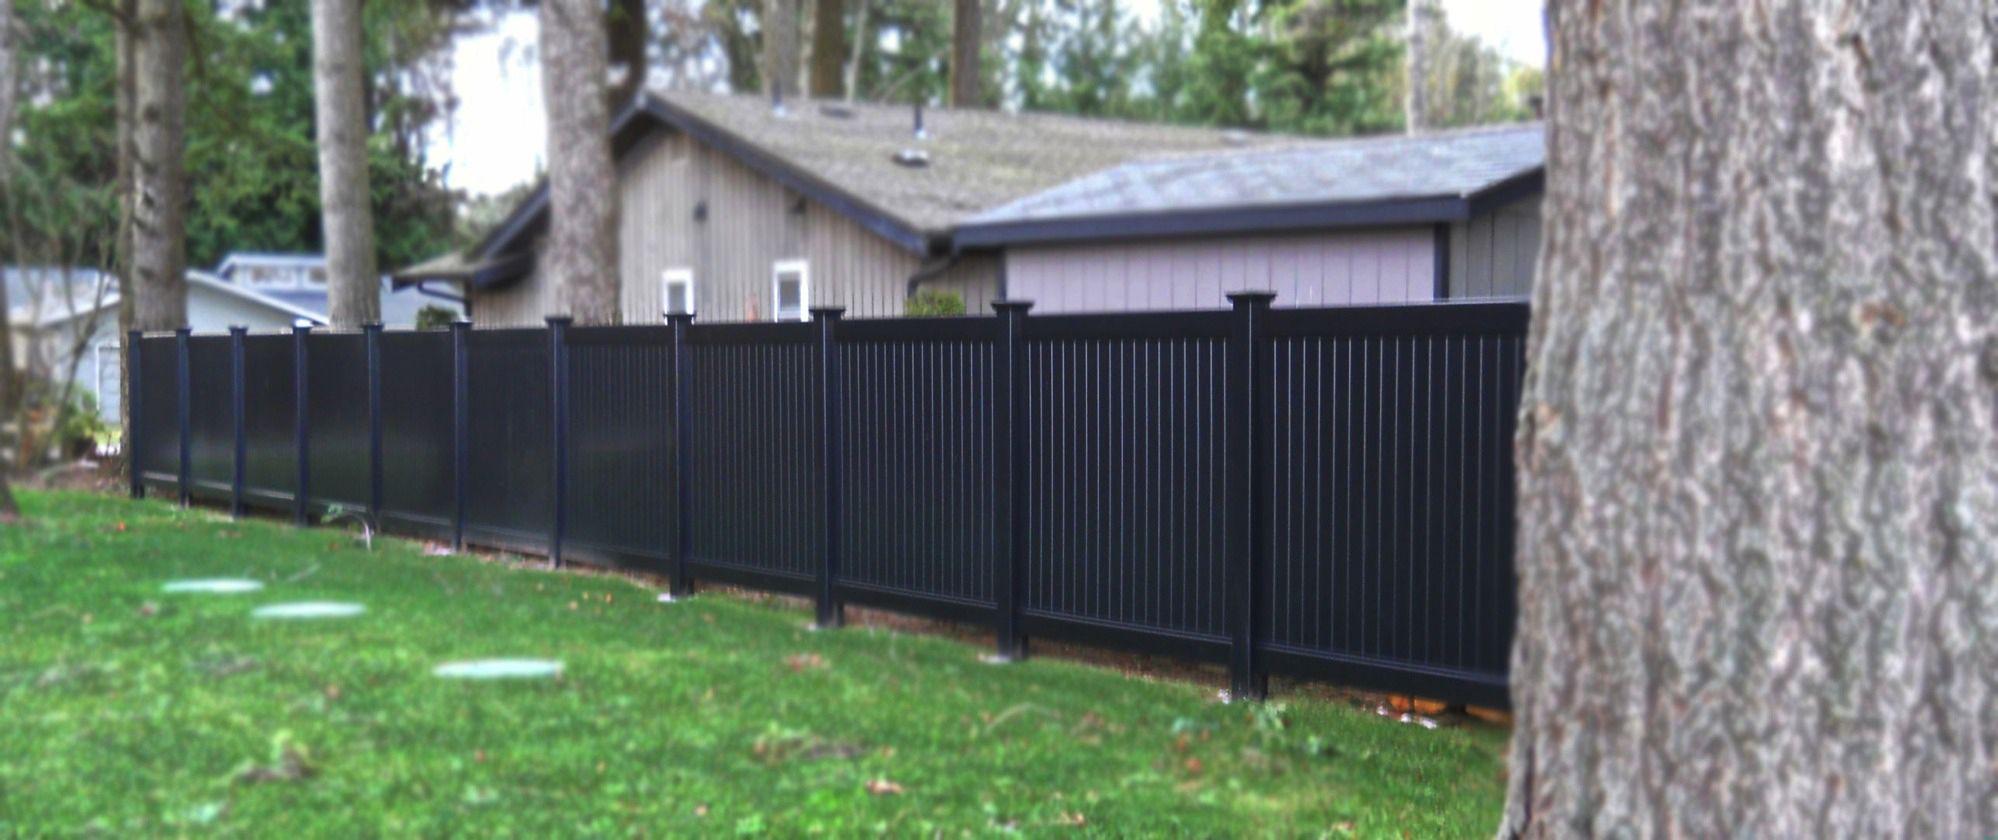 Black Privacy Fence